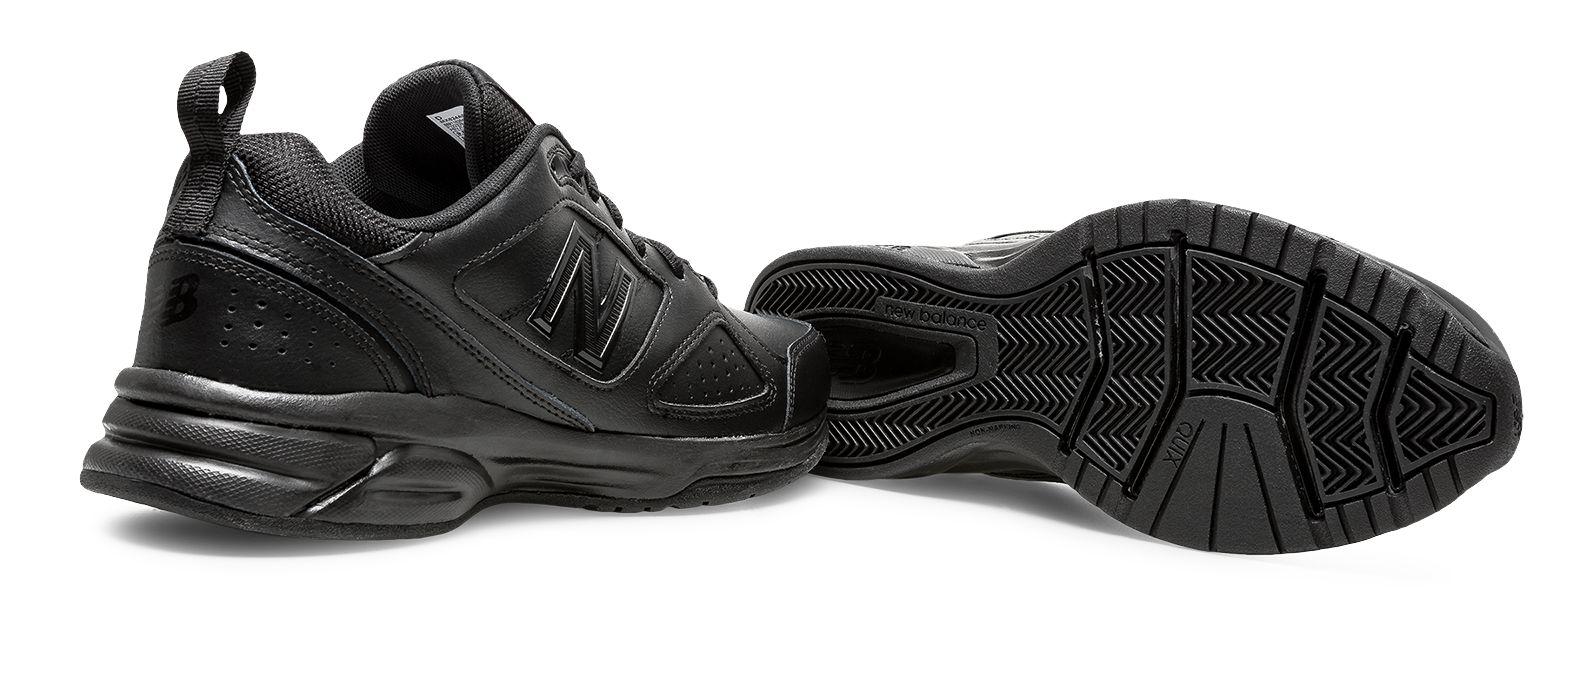 thumbnail 14 - New Balance 624v4 Leather Men's Running Running Training Shoes